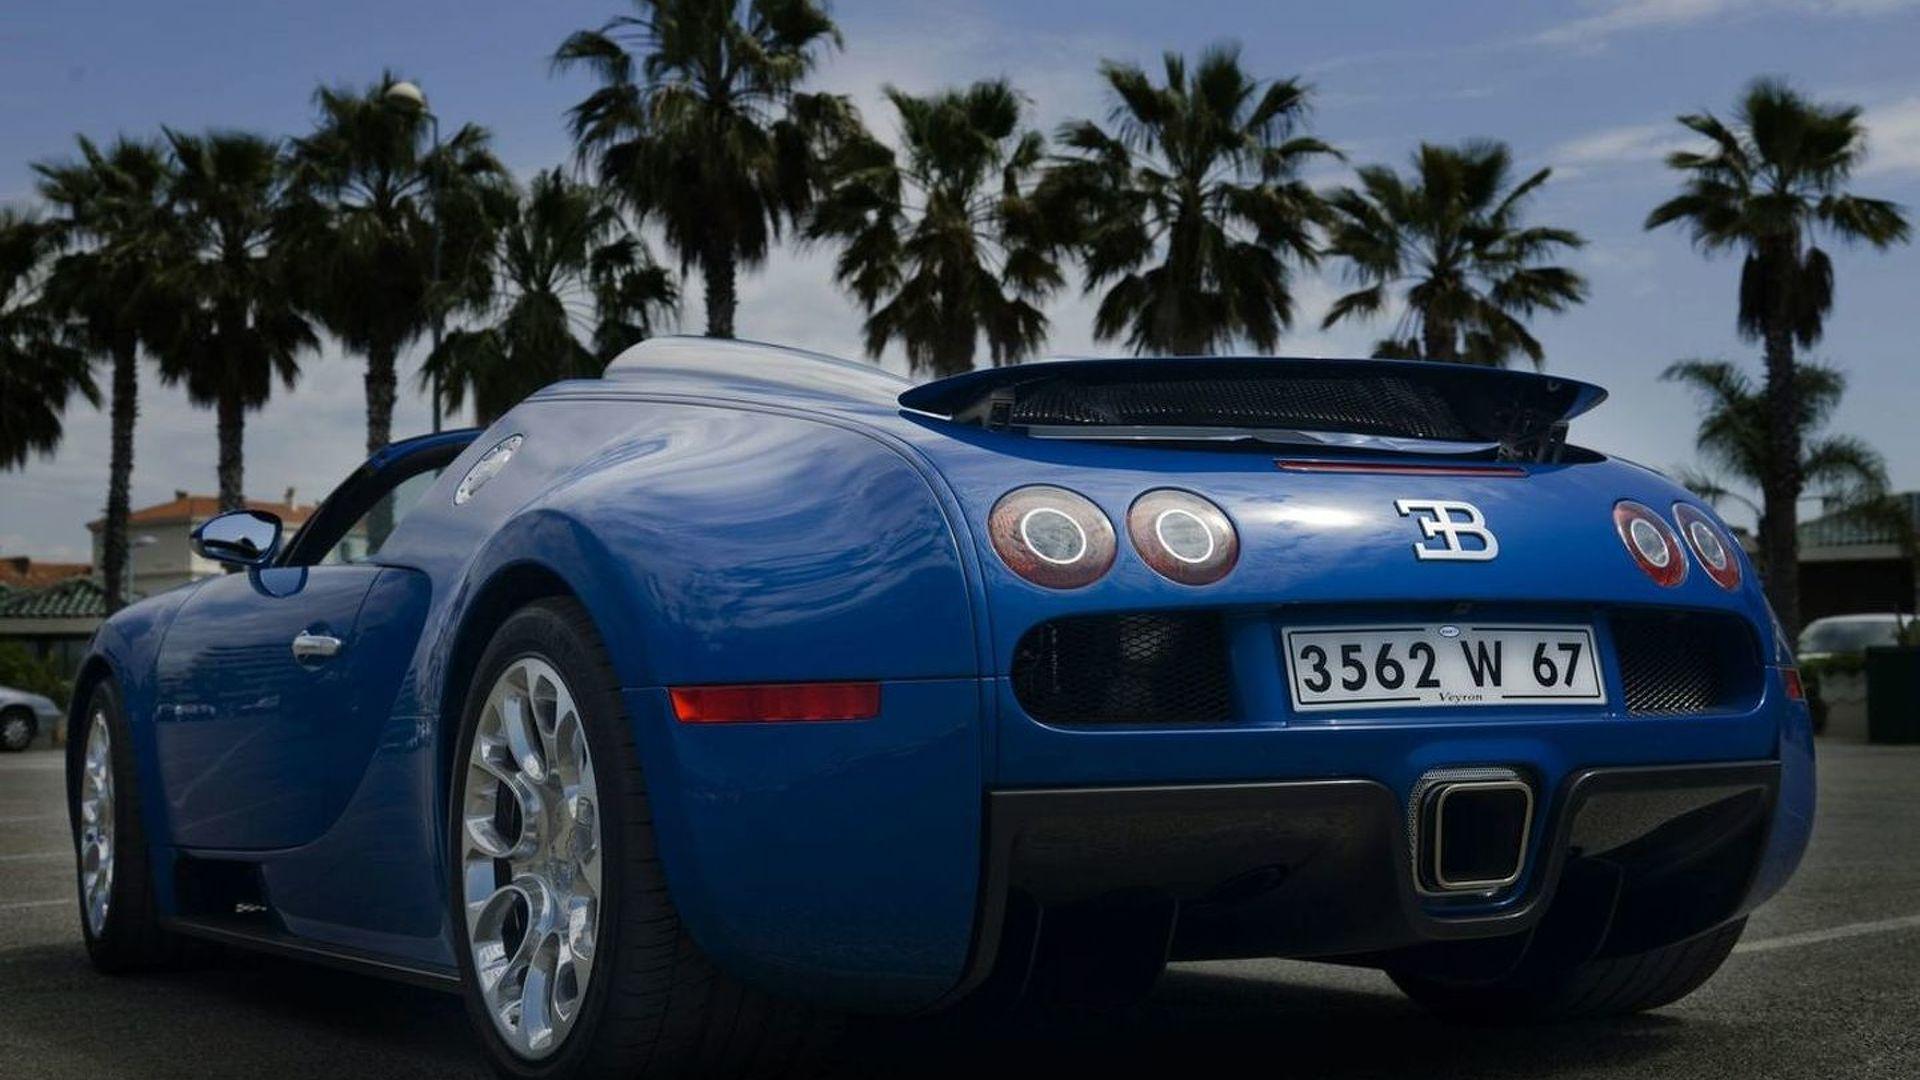 Bugatti veyron grand sport production begins product 2009 05 26 22 55 20